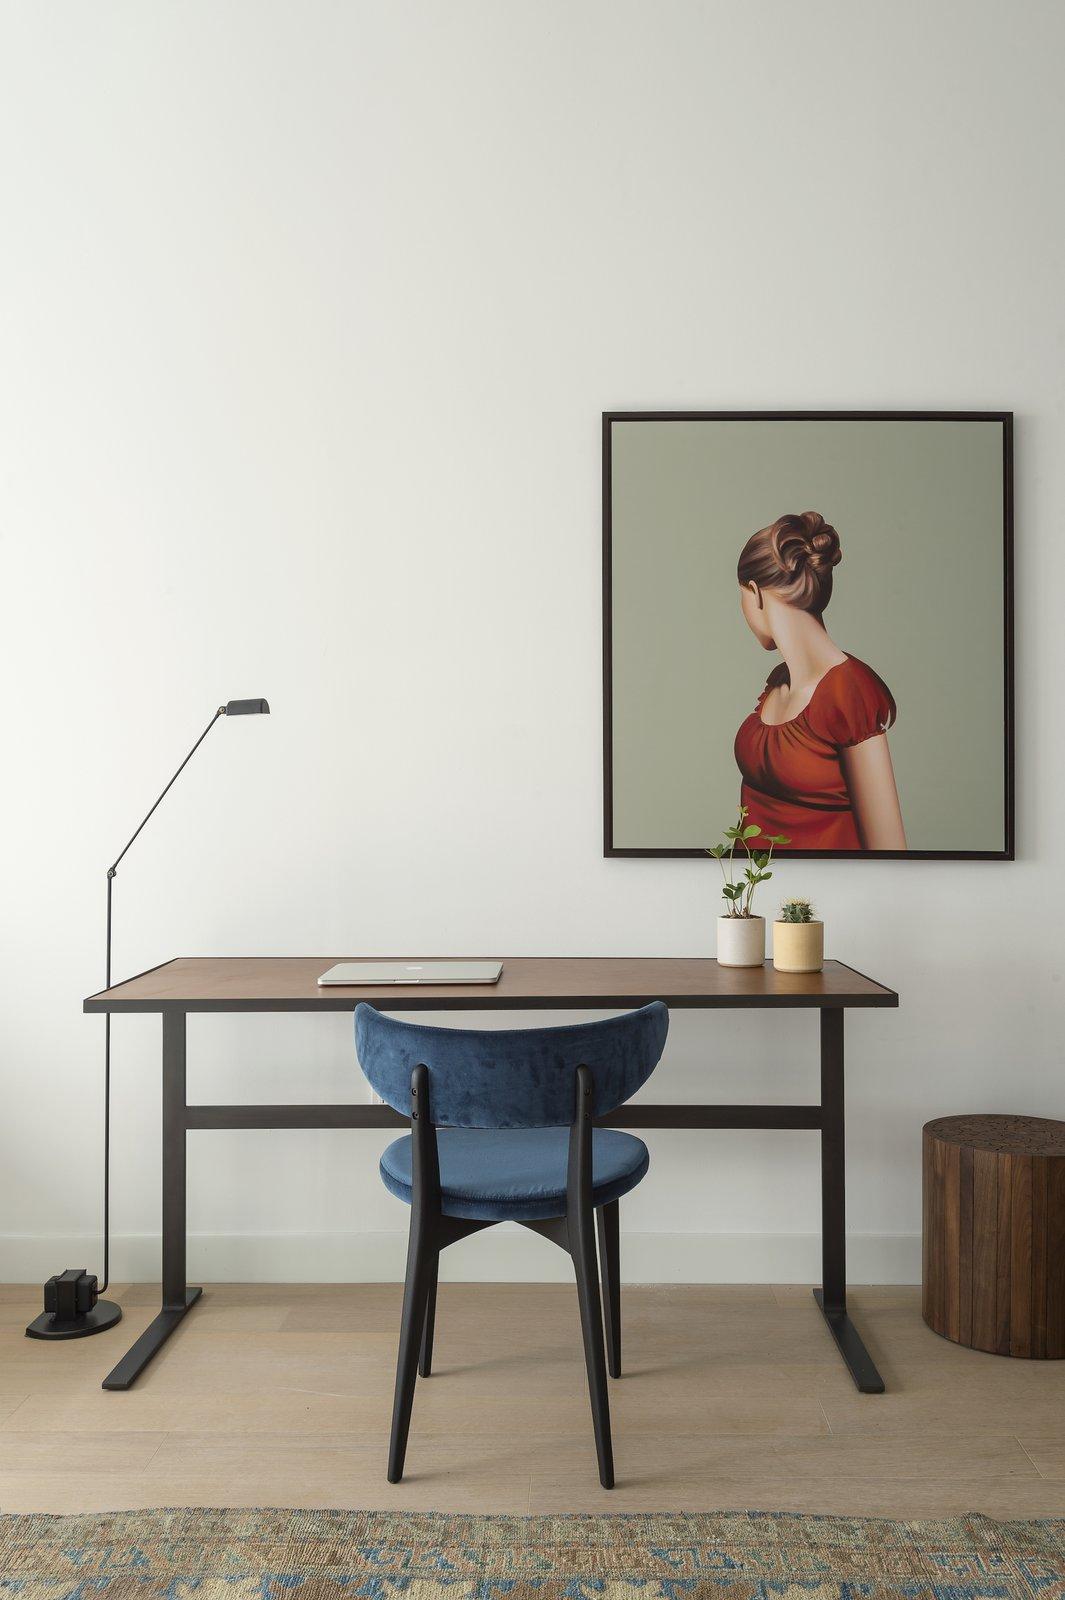 Office, Light Hardwood Floor, Rug Floor, Lamps, Study Room Type, Chair, and Desk  ROOST Apartment Hotel